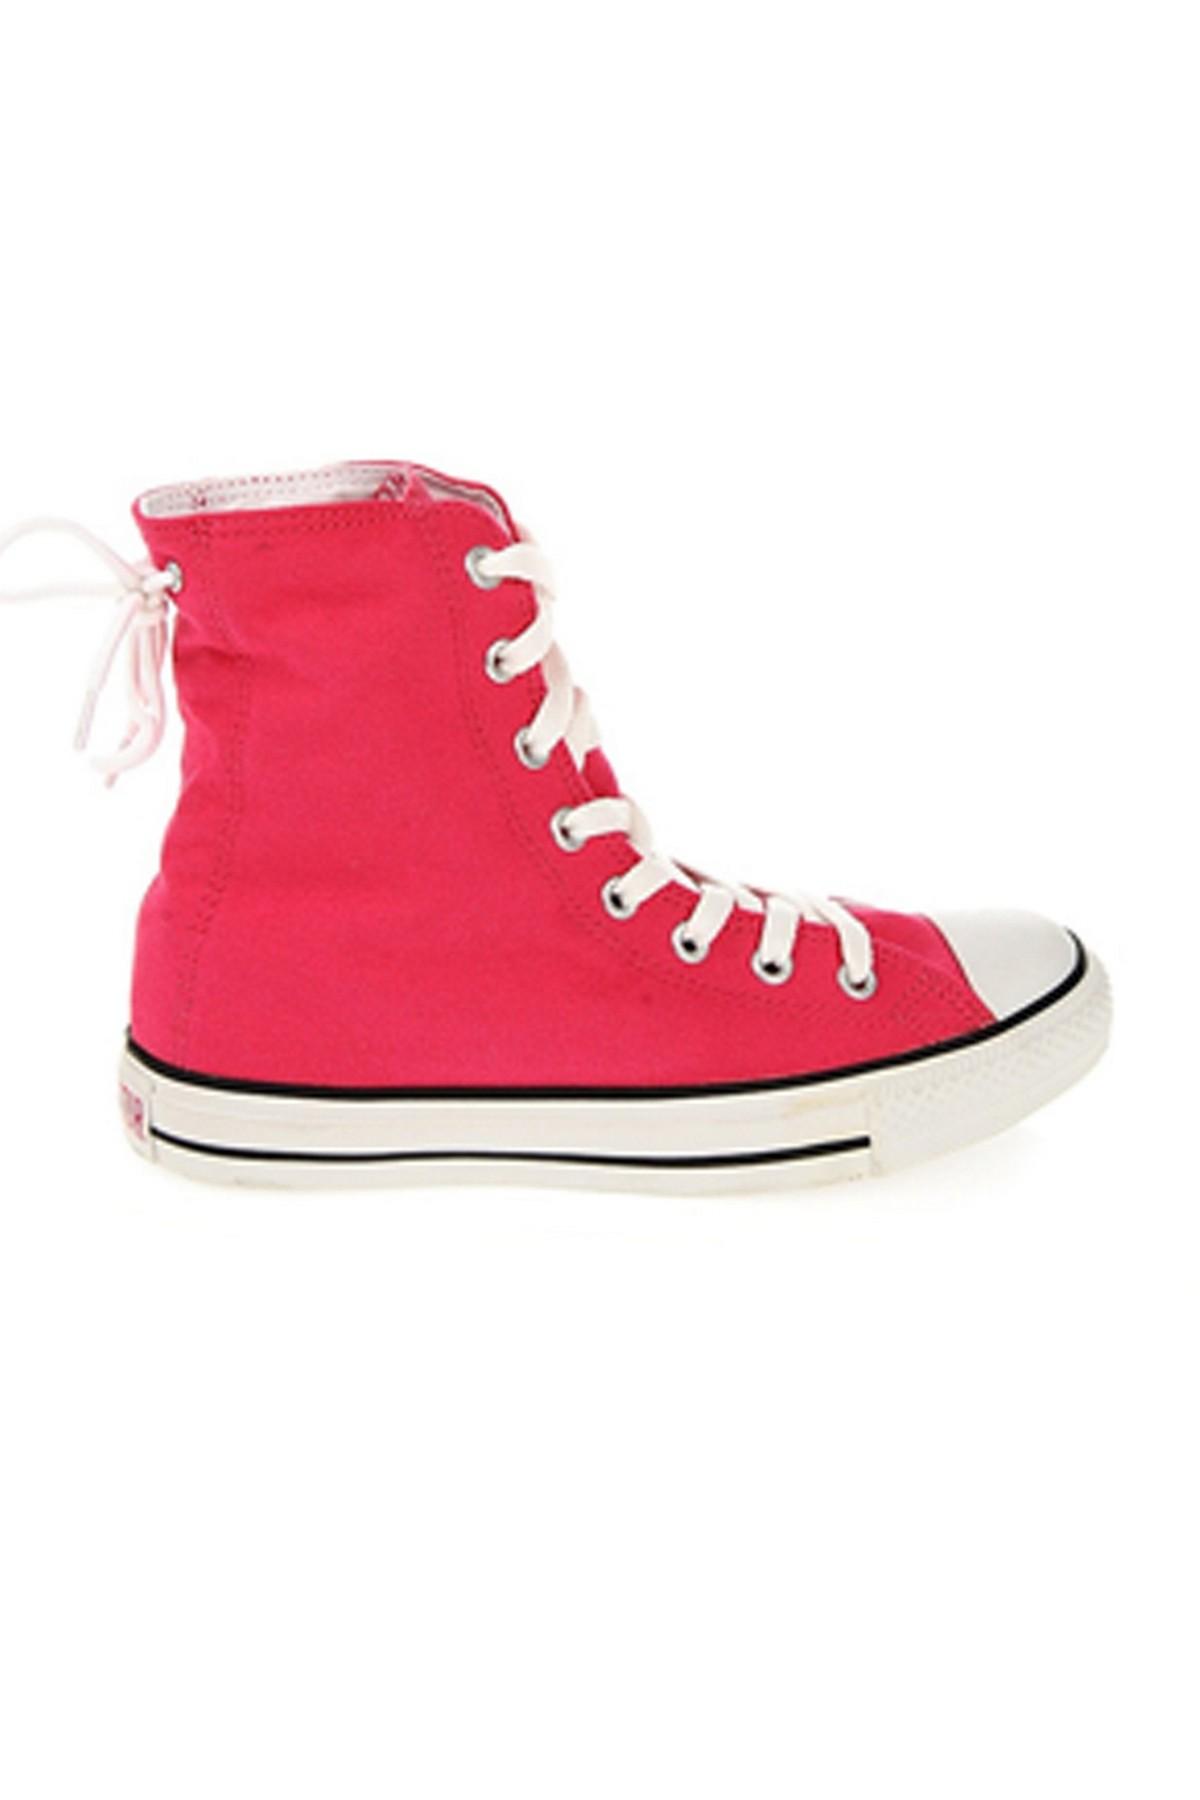 Converse Chuck Taylor All Star Unisex Pembe Sneaker (522199)